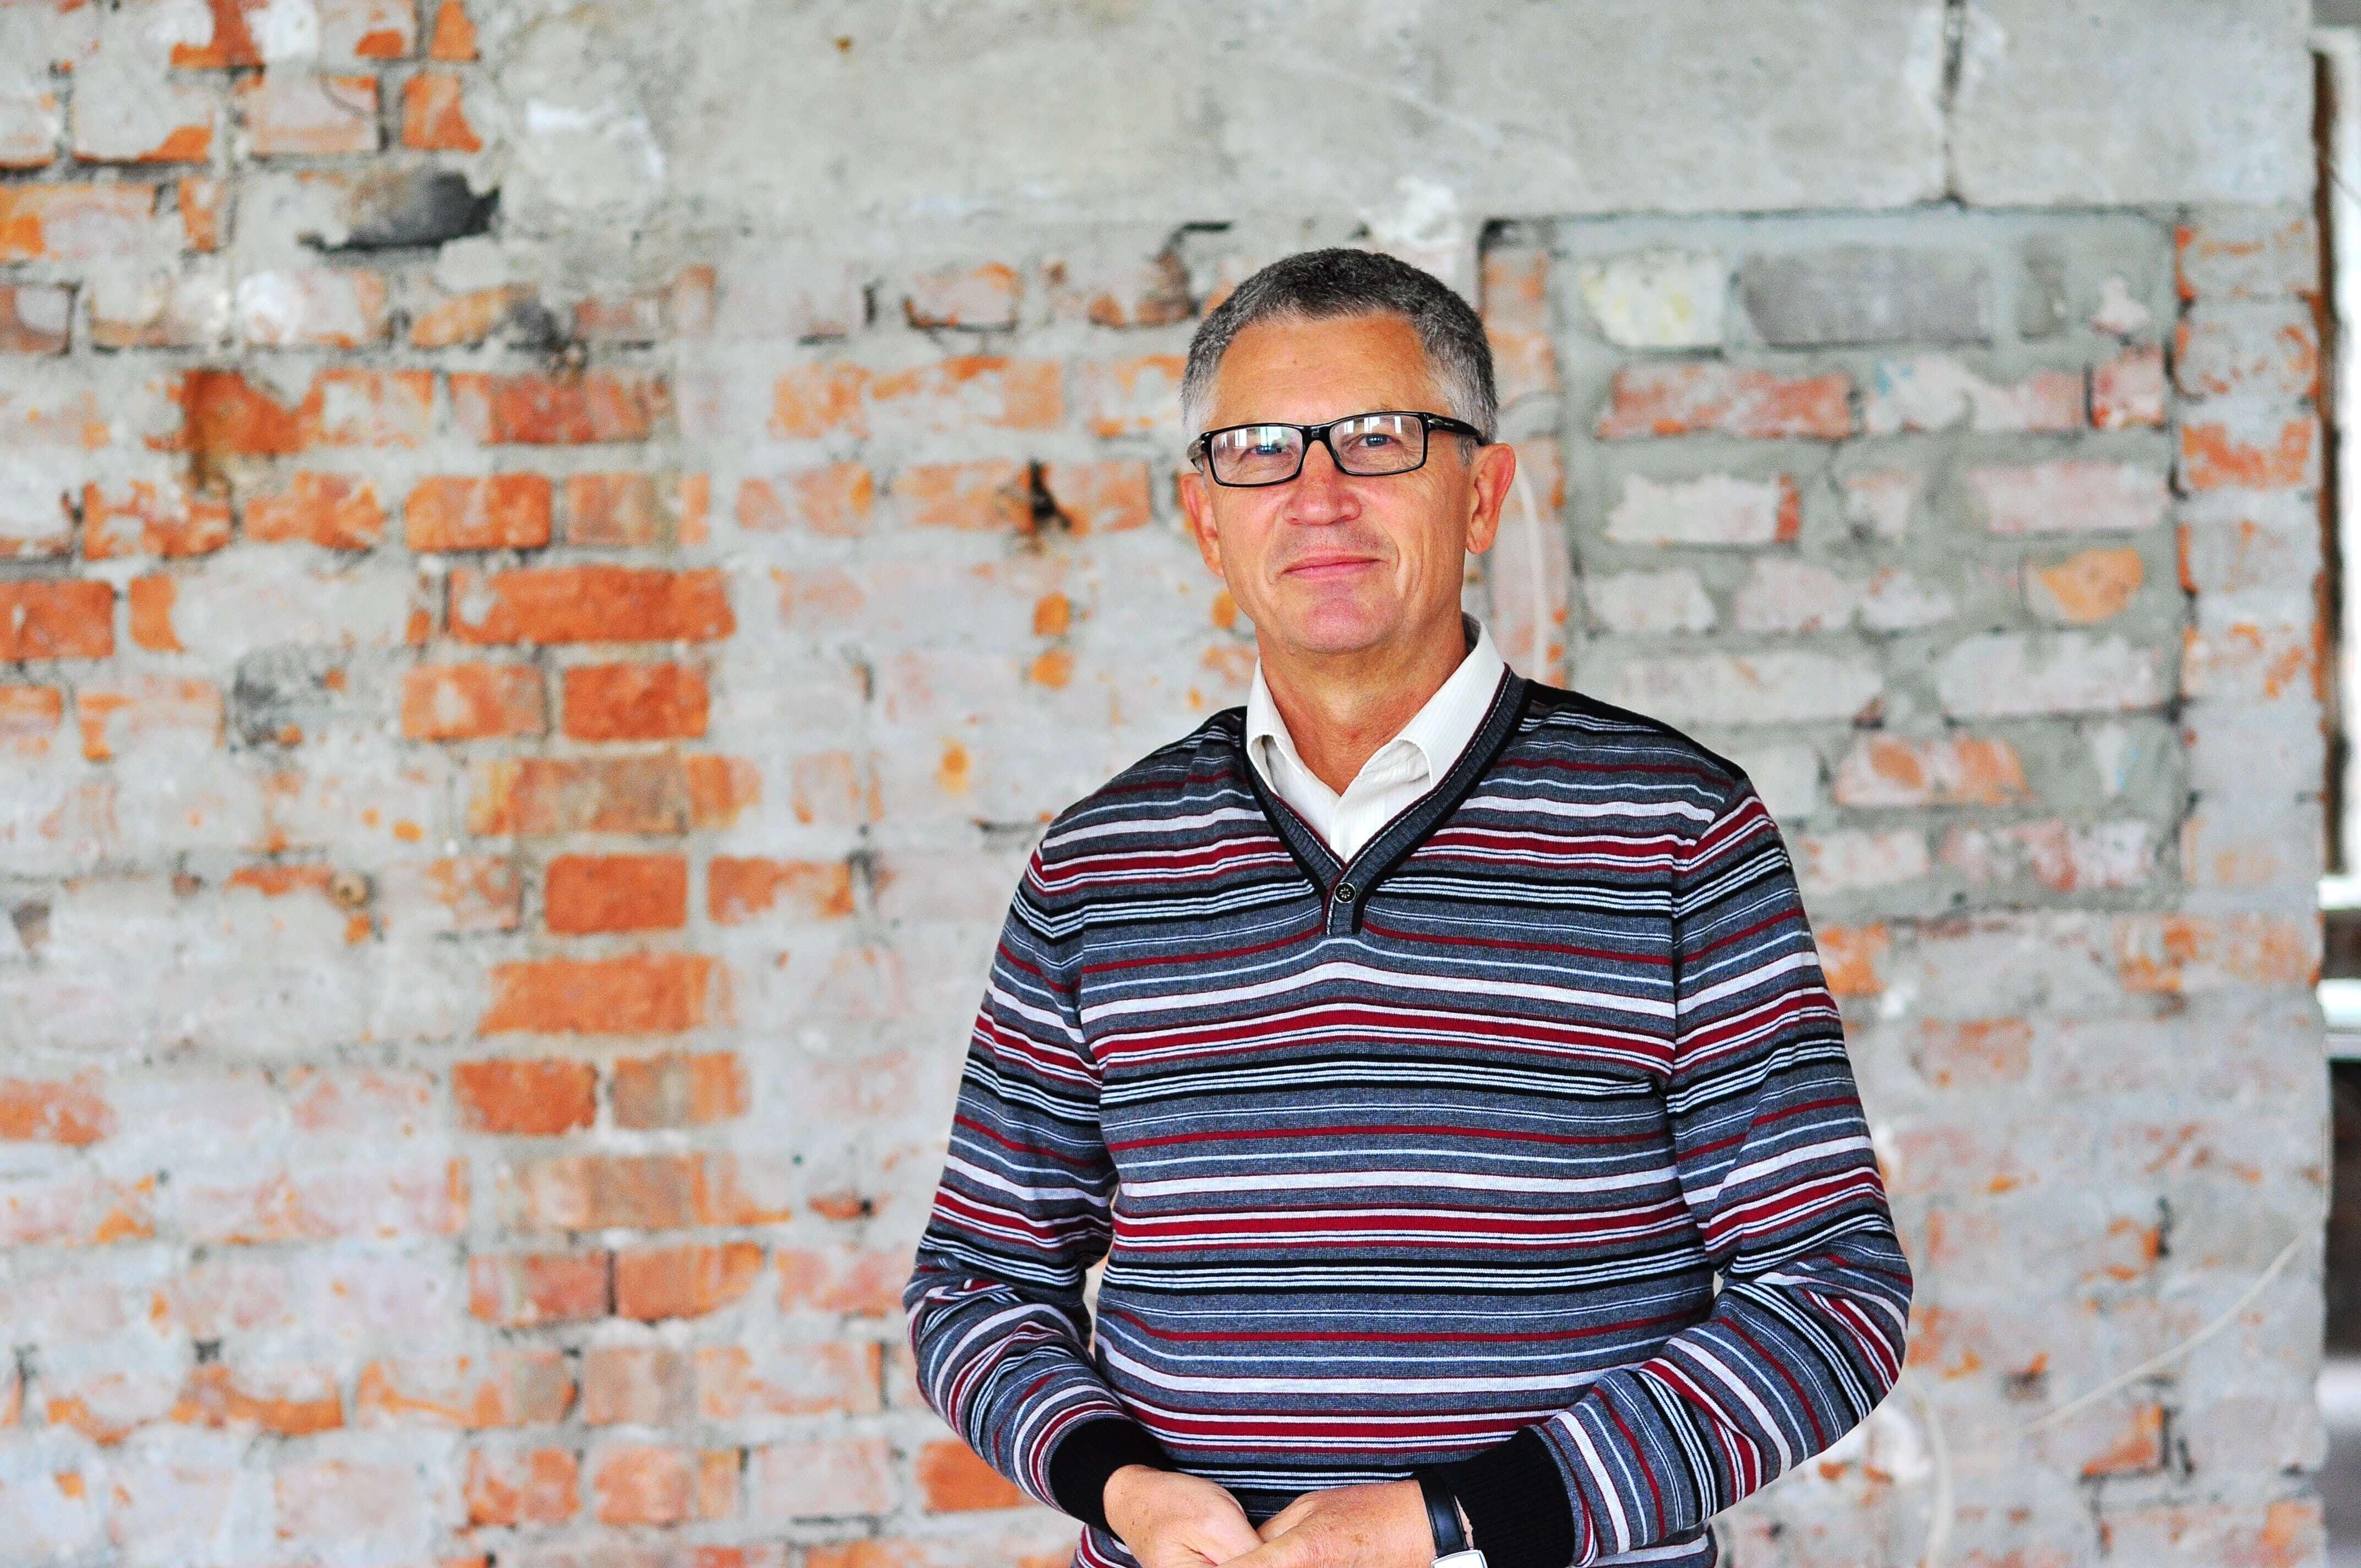 Image of Павел Гуков, Продаж і маркетинг at ProOrganica